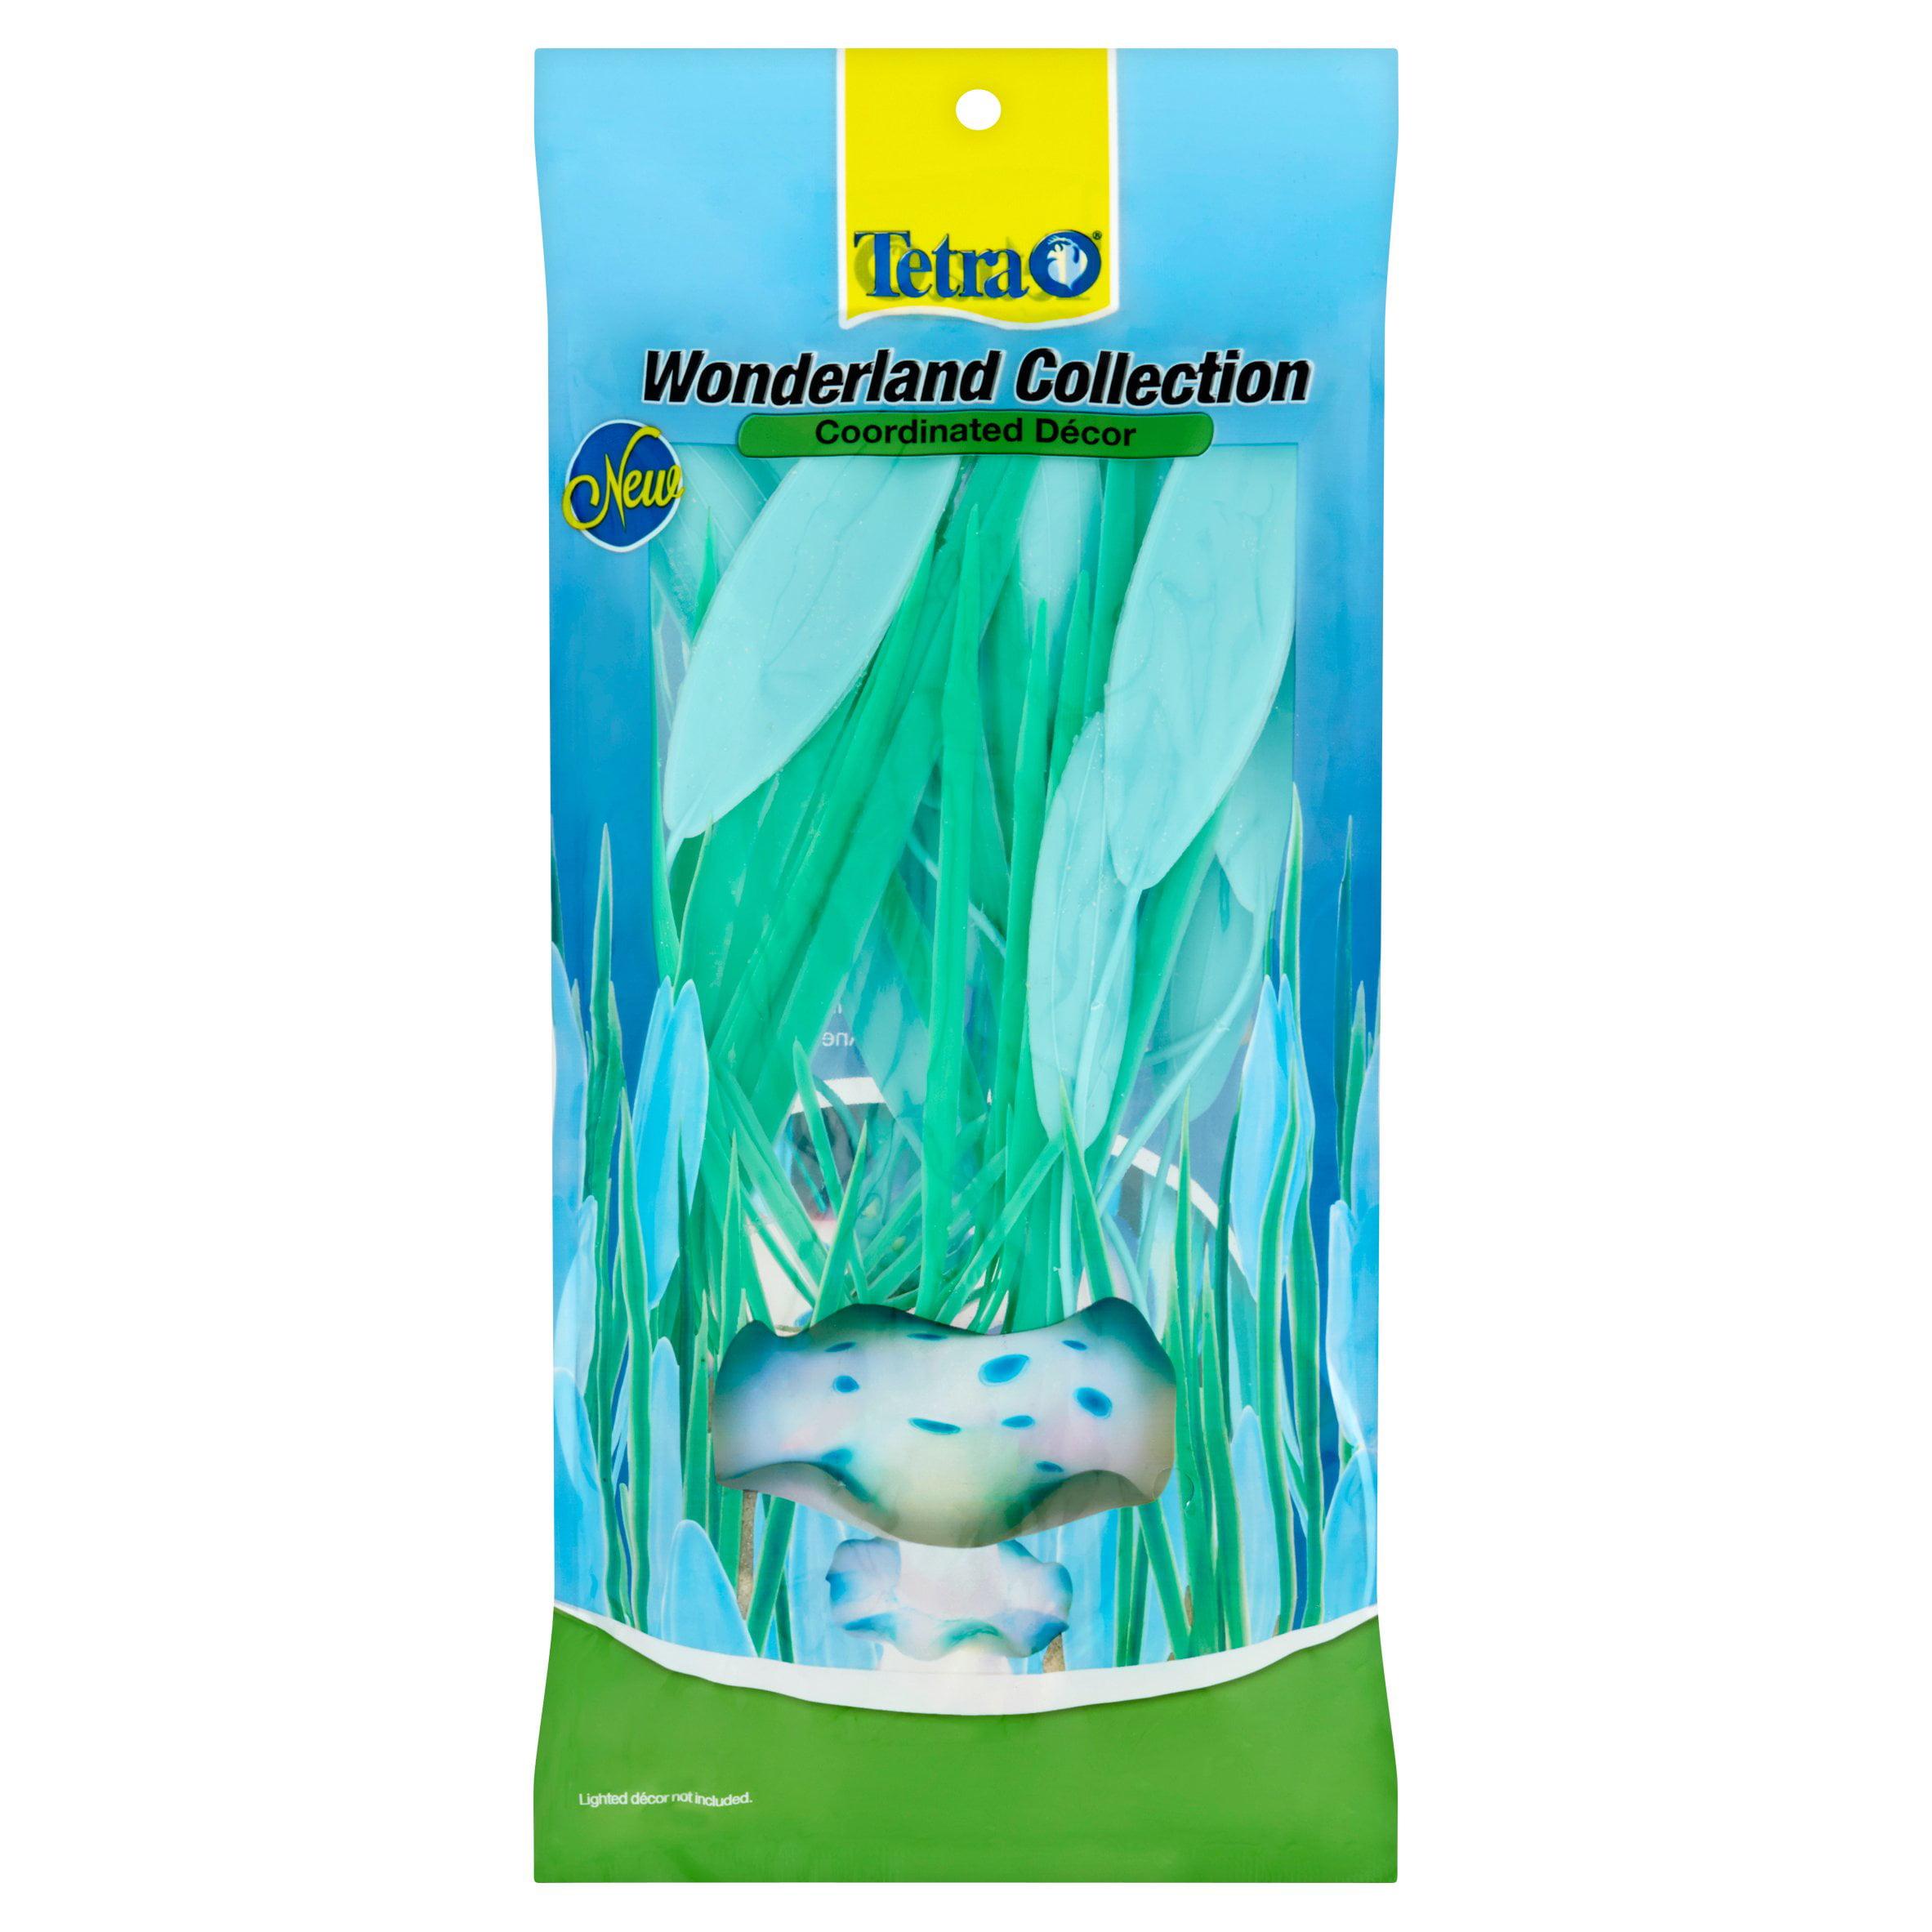 Tetra Wonderland Collection Coordinated Decór Aquarium Plants by United Pet Group, Inc. (UPG)